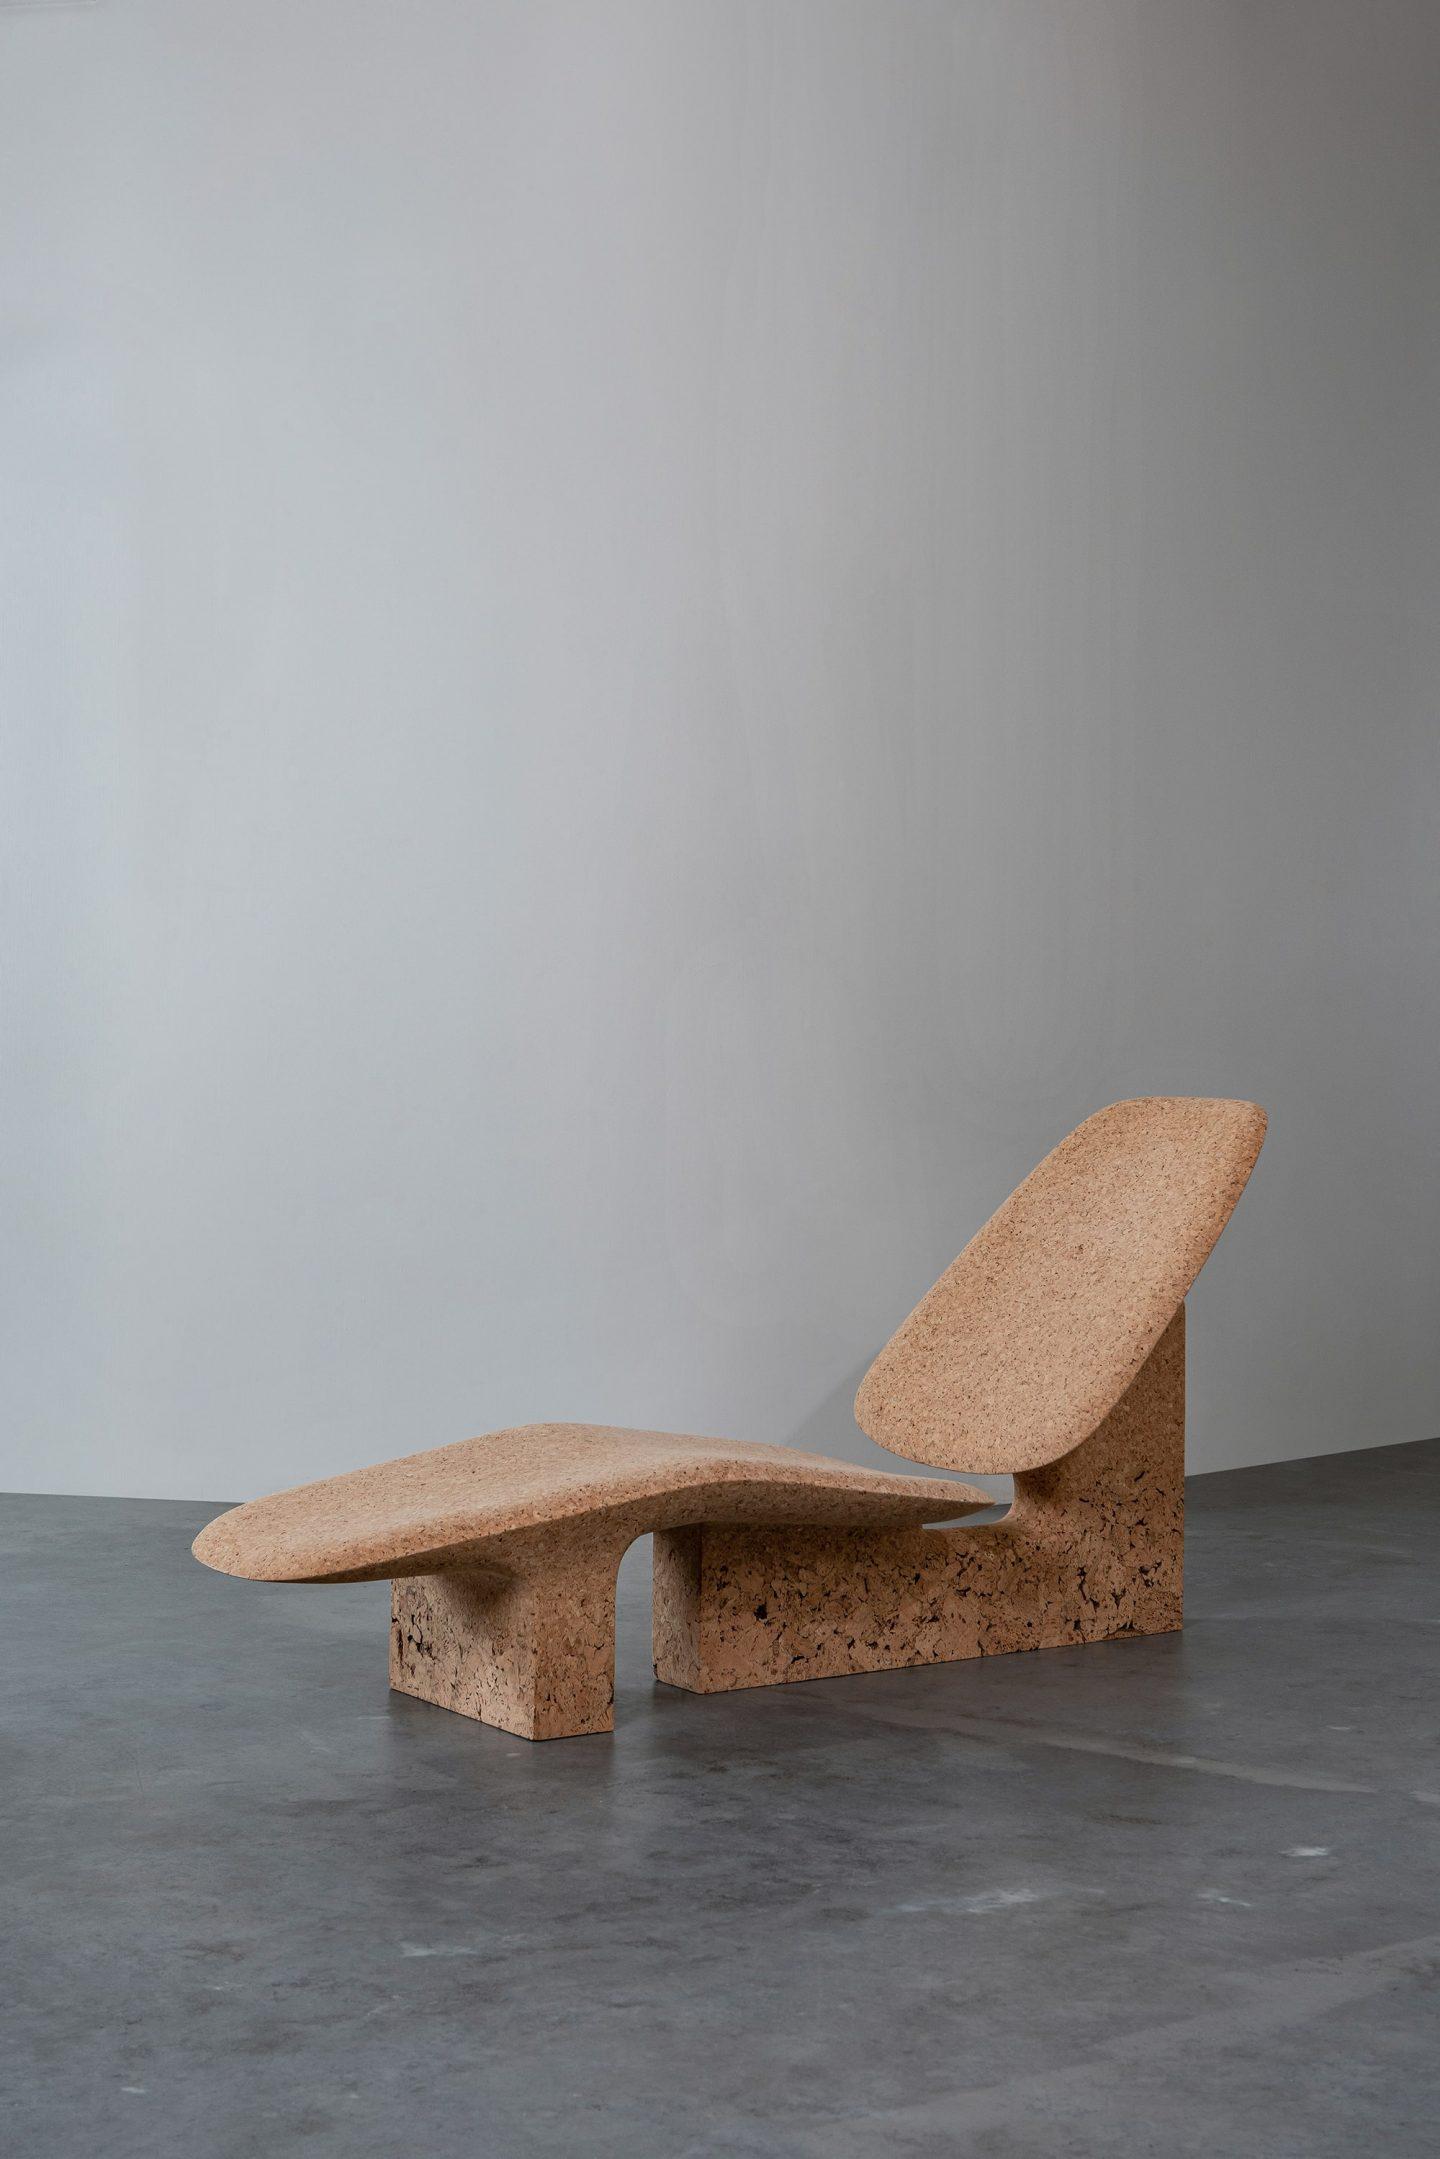 IGNANT-Design-Burnt-Cork-Noé-Duchaufour-10